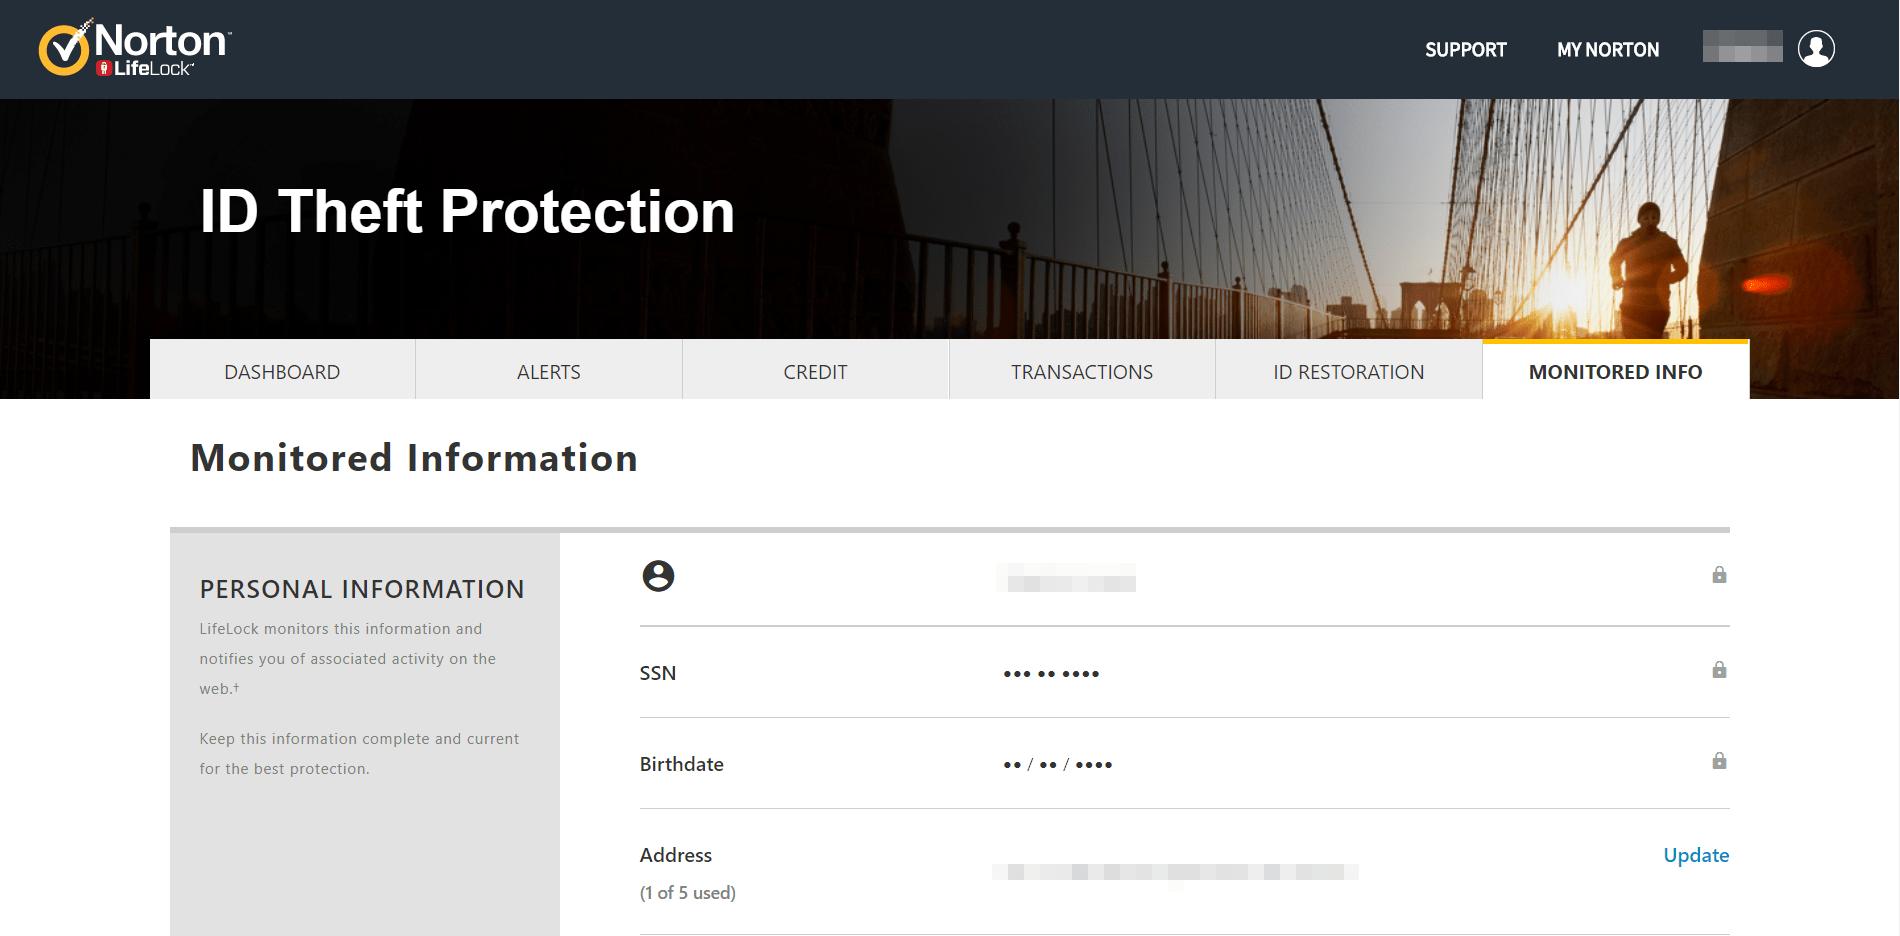 LifeLock Monitored Information